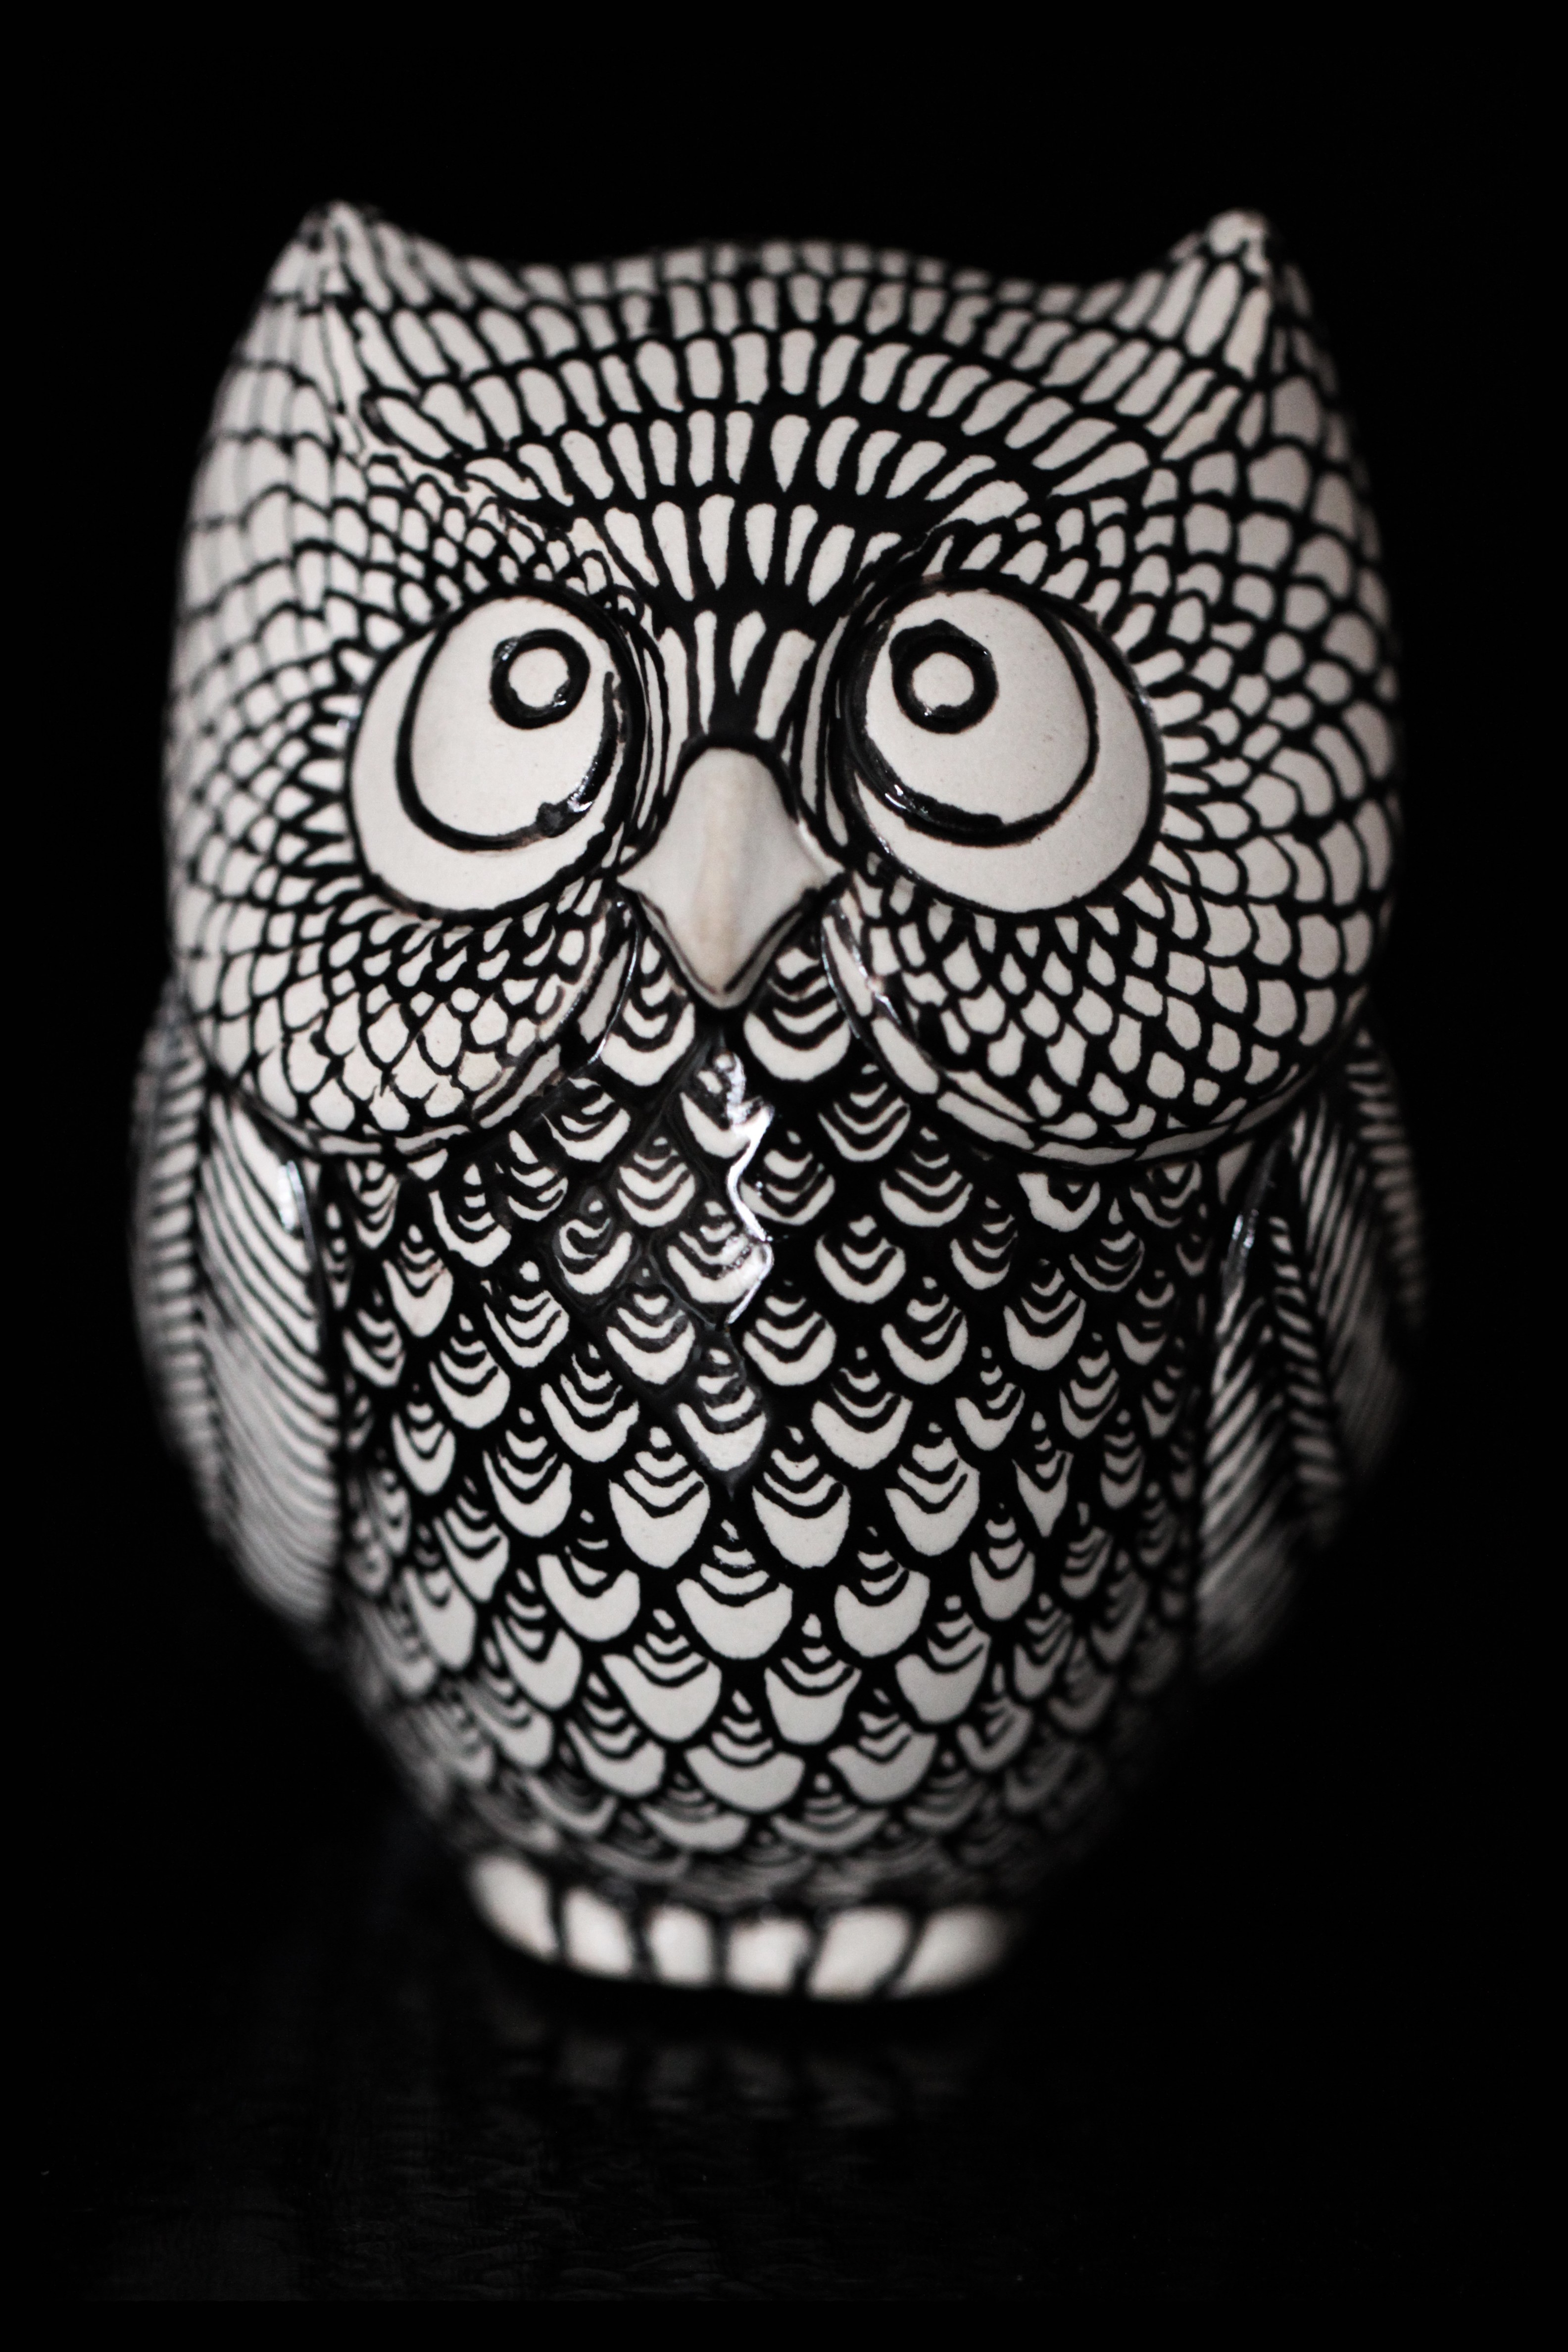 OWL(3)